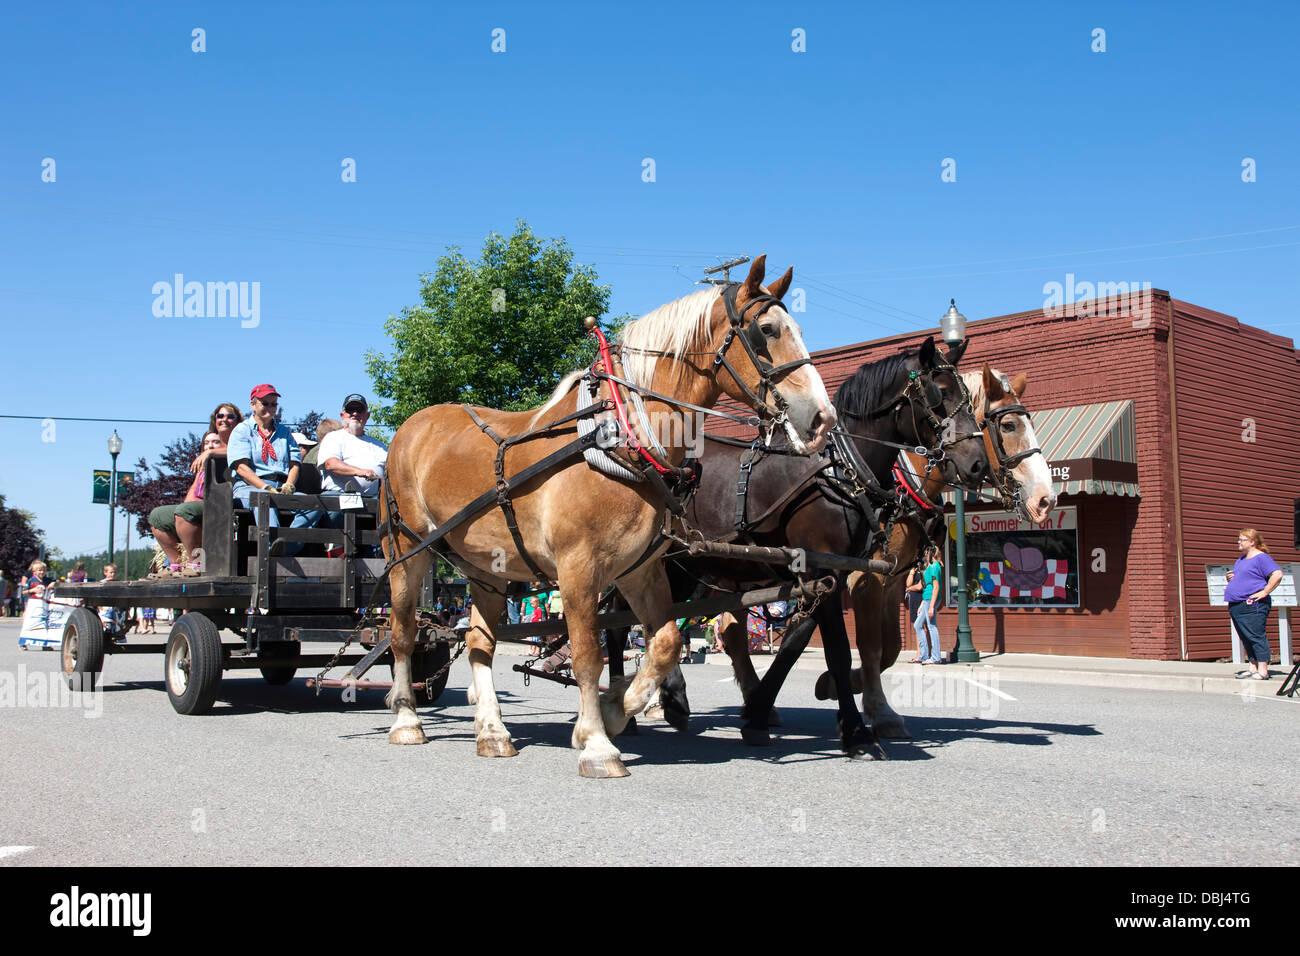 Draft horses in parade. - Stock Image